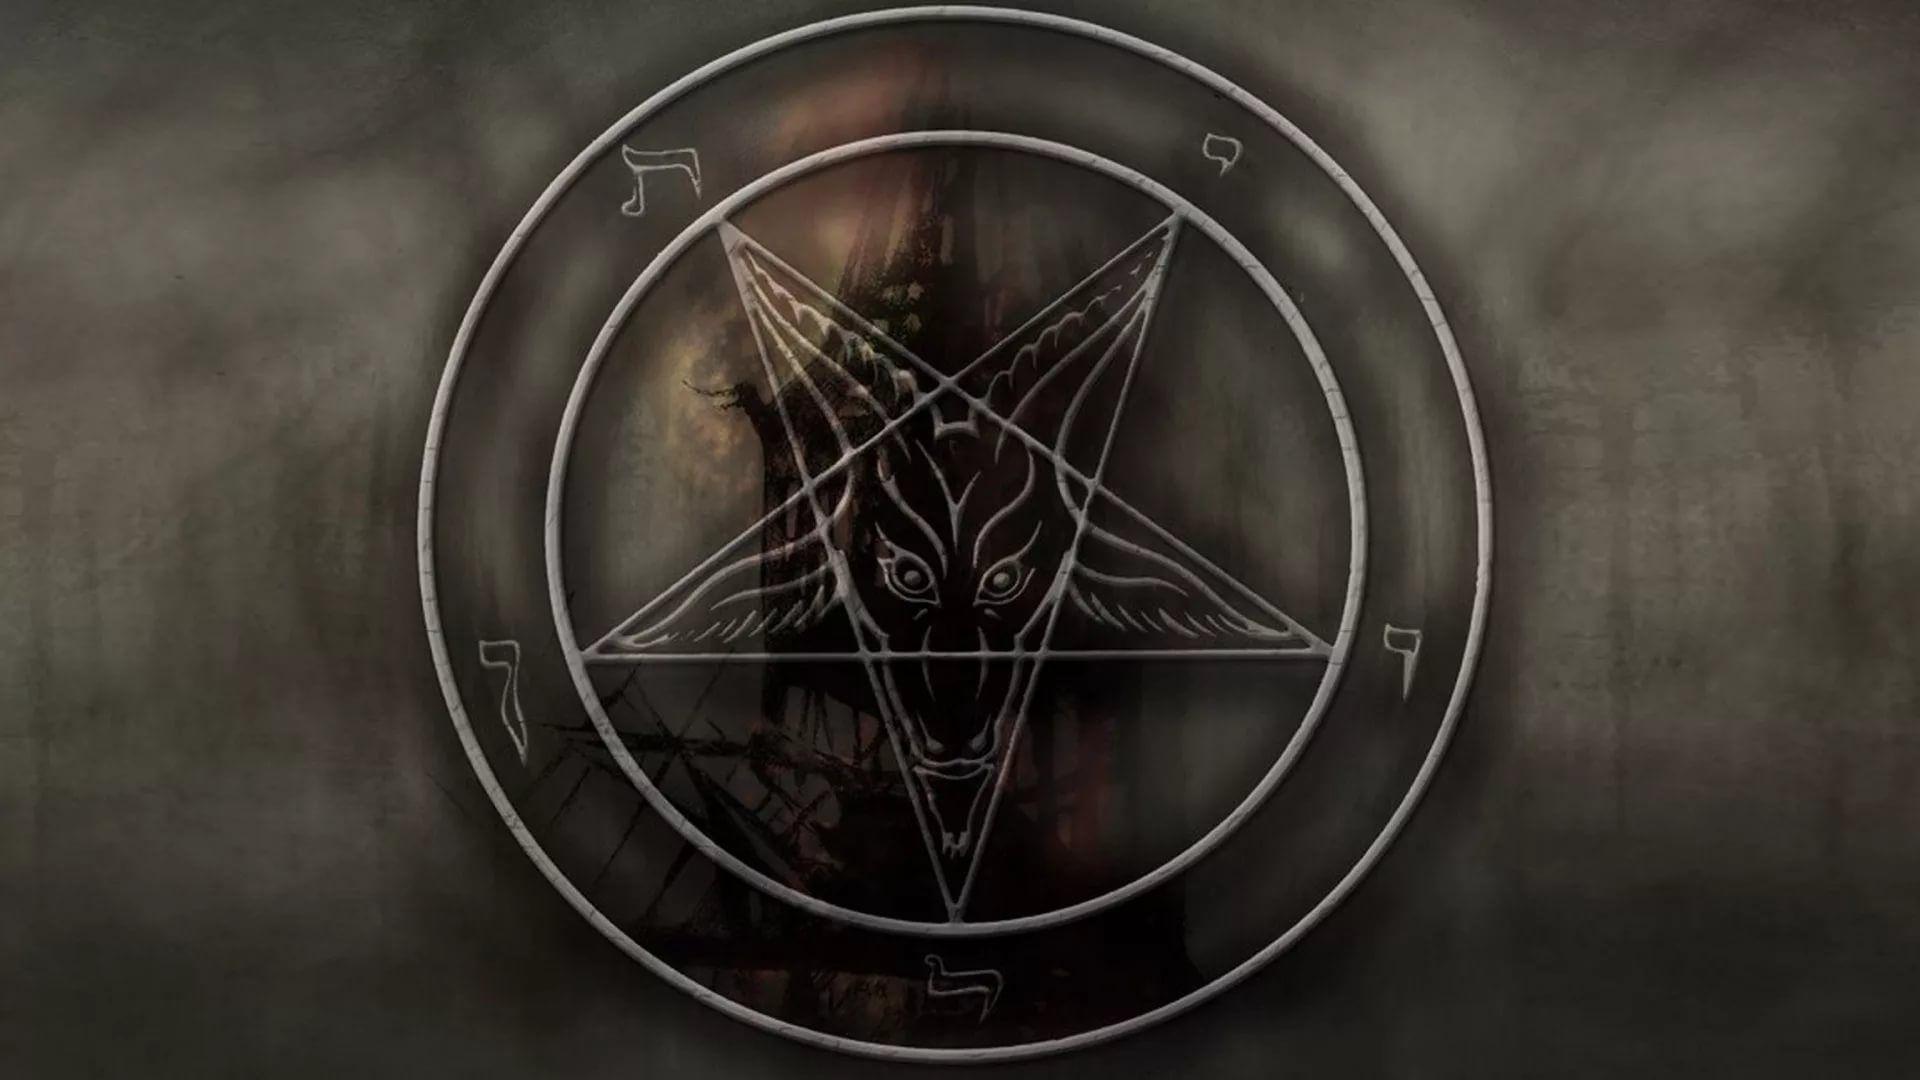 Pentagram Good Wallpaper